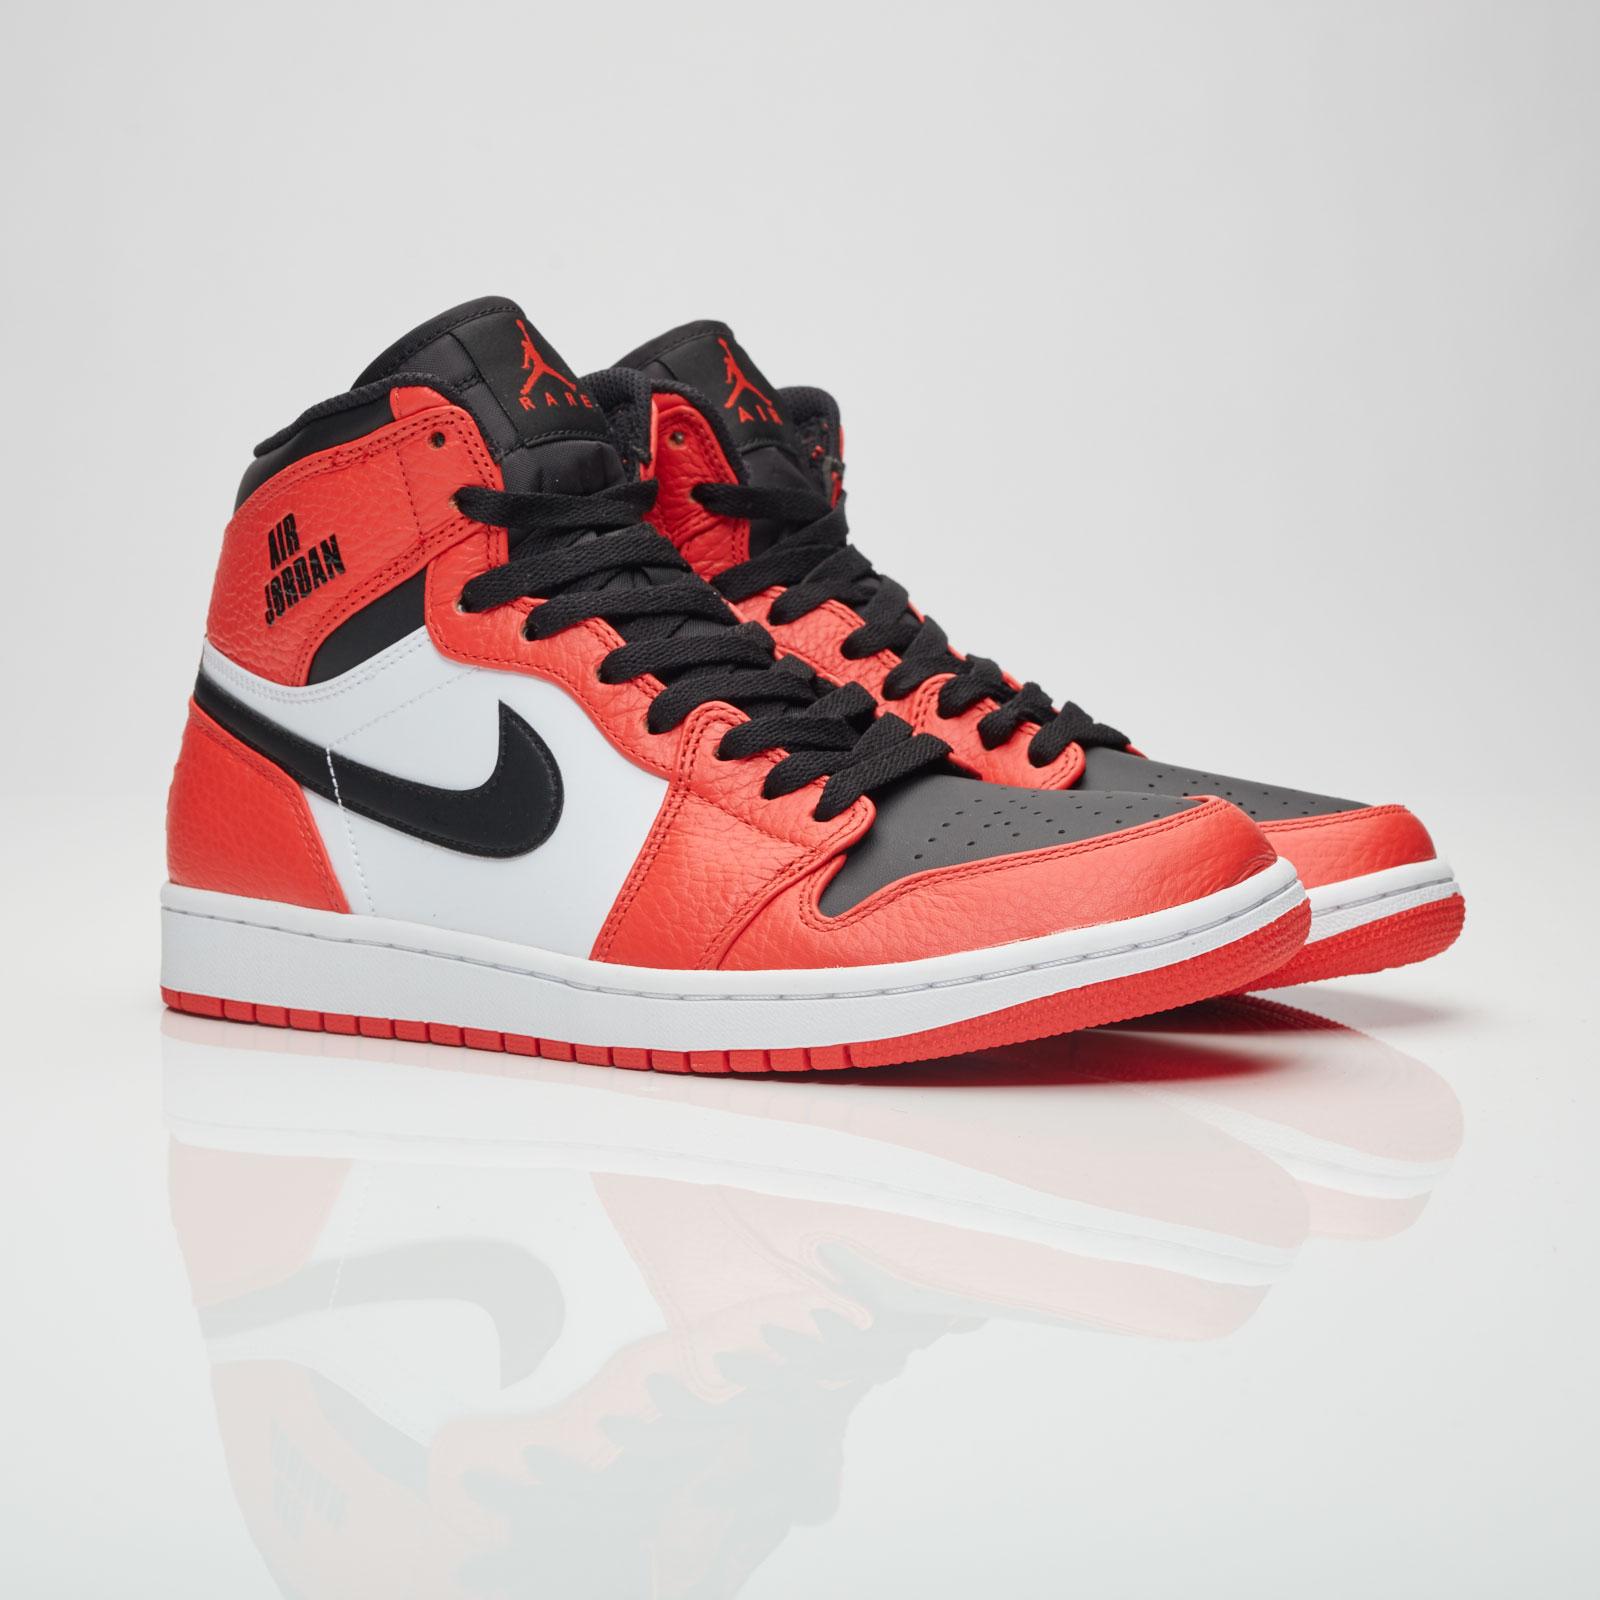 detailed look 7e1ce 925fa Jordan Brand Air Jordan 1 Retro High